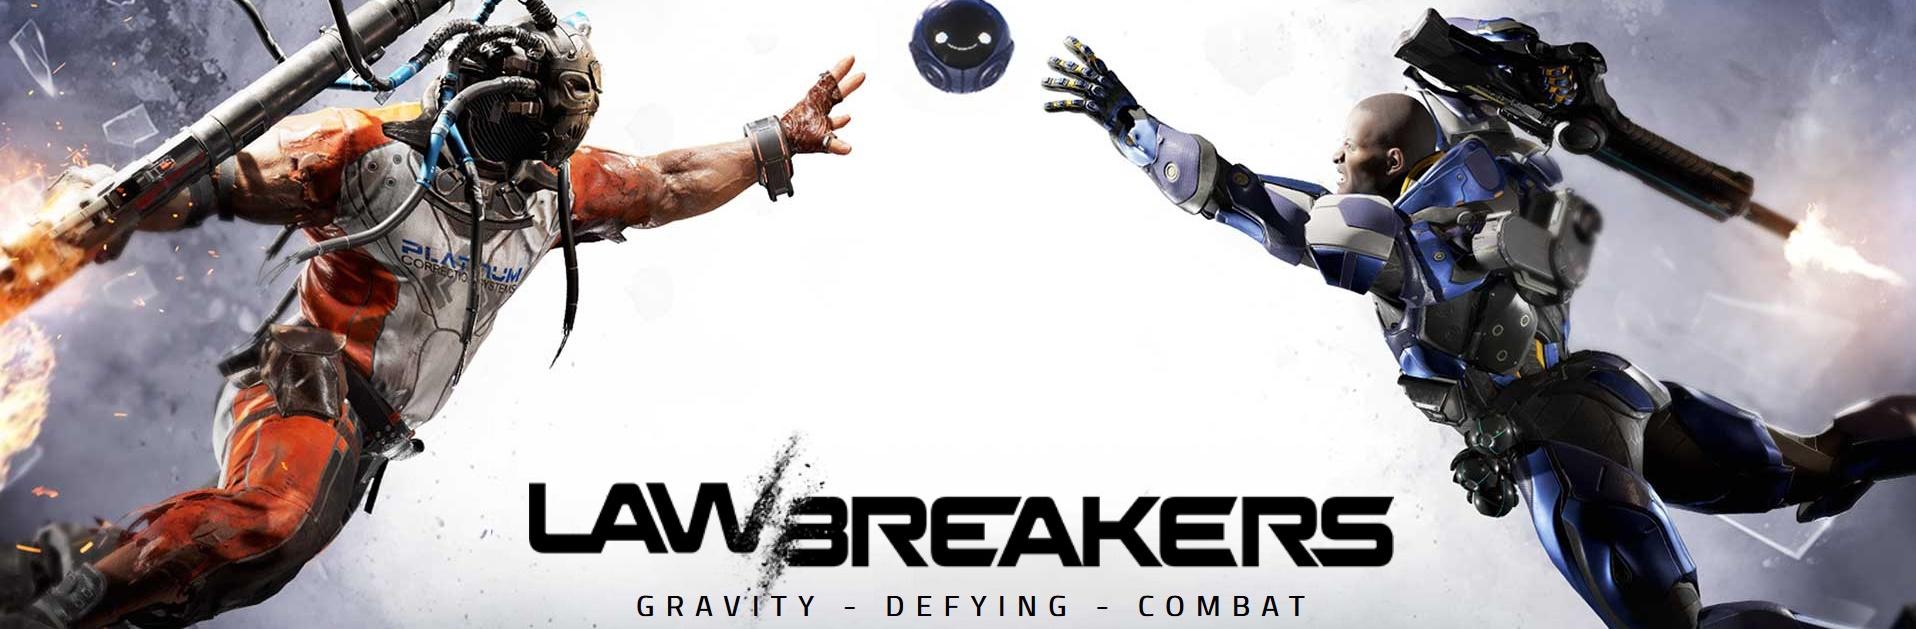 lawbreakers-gamelbuts.jpg